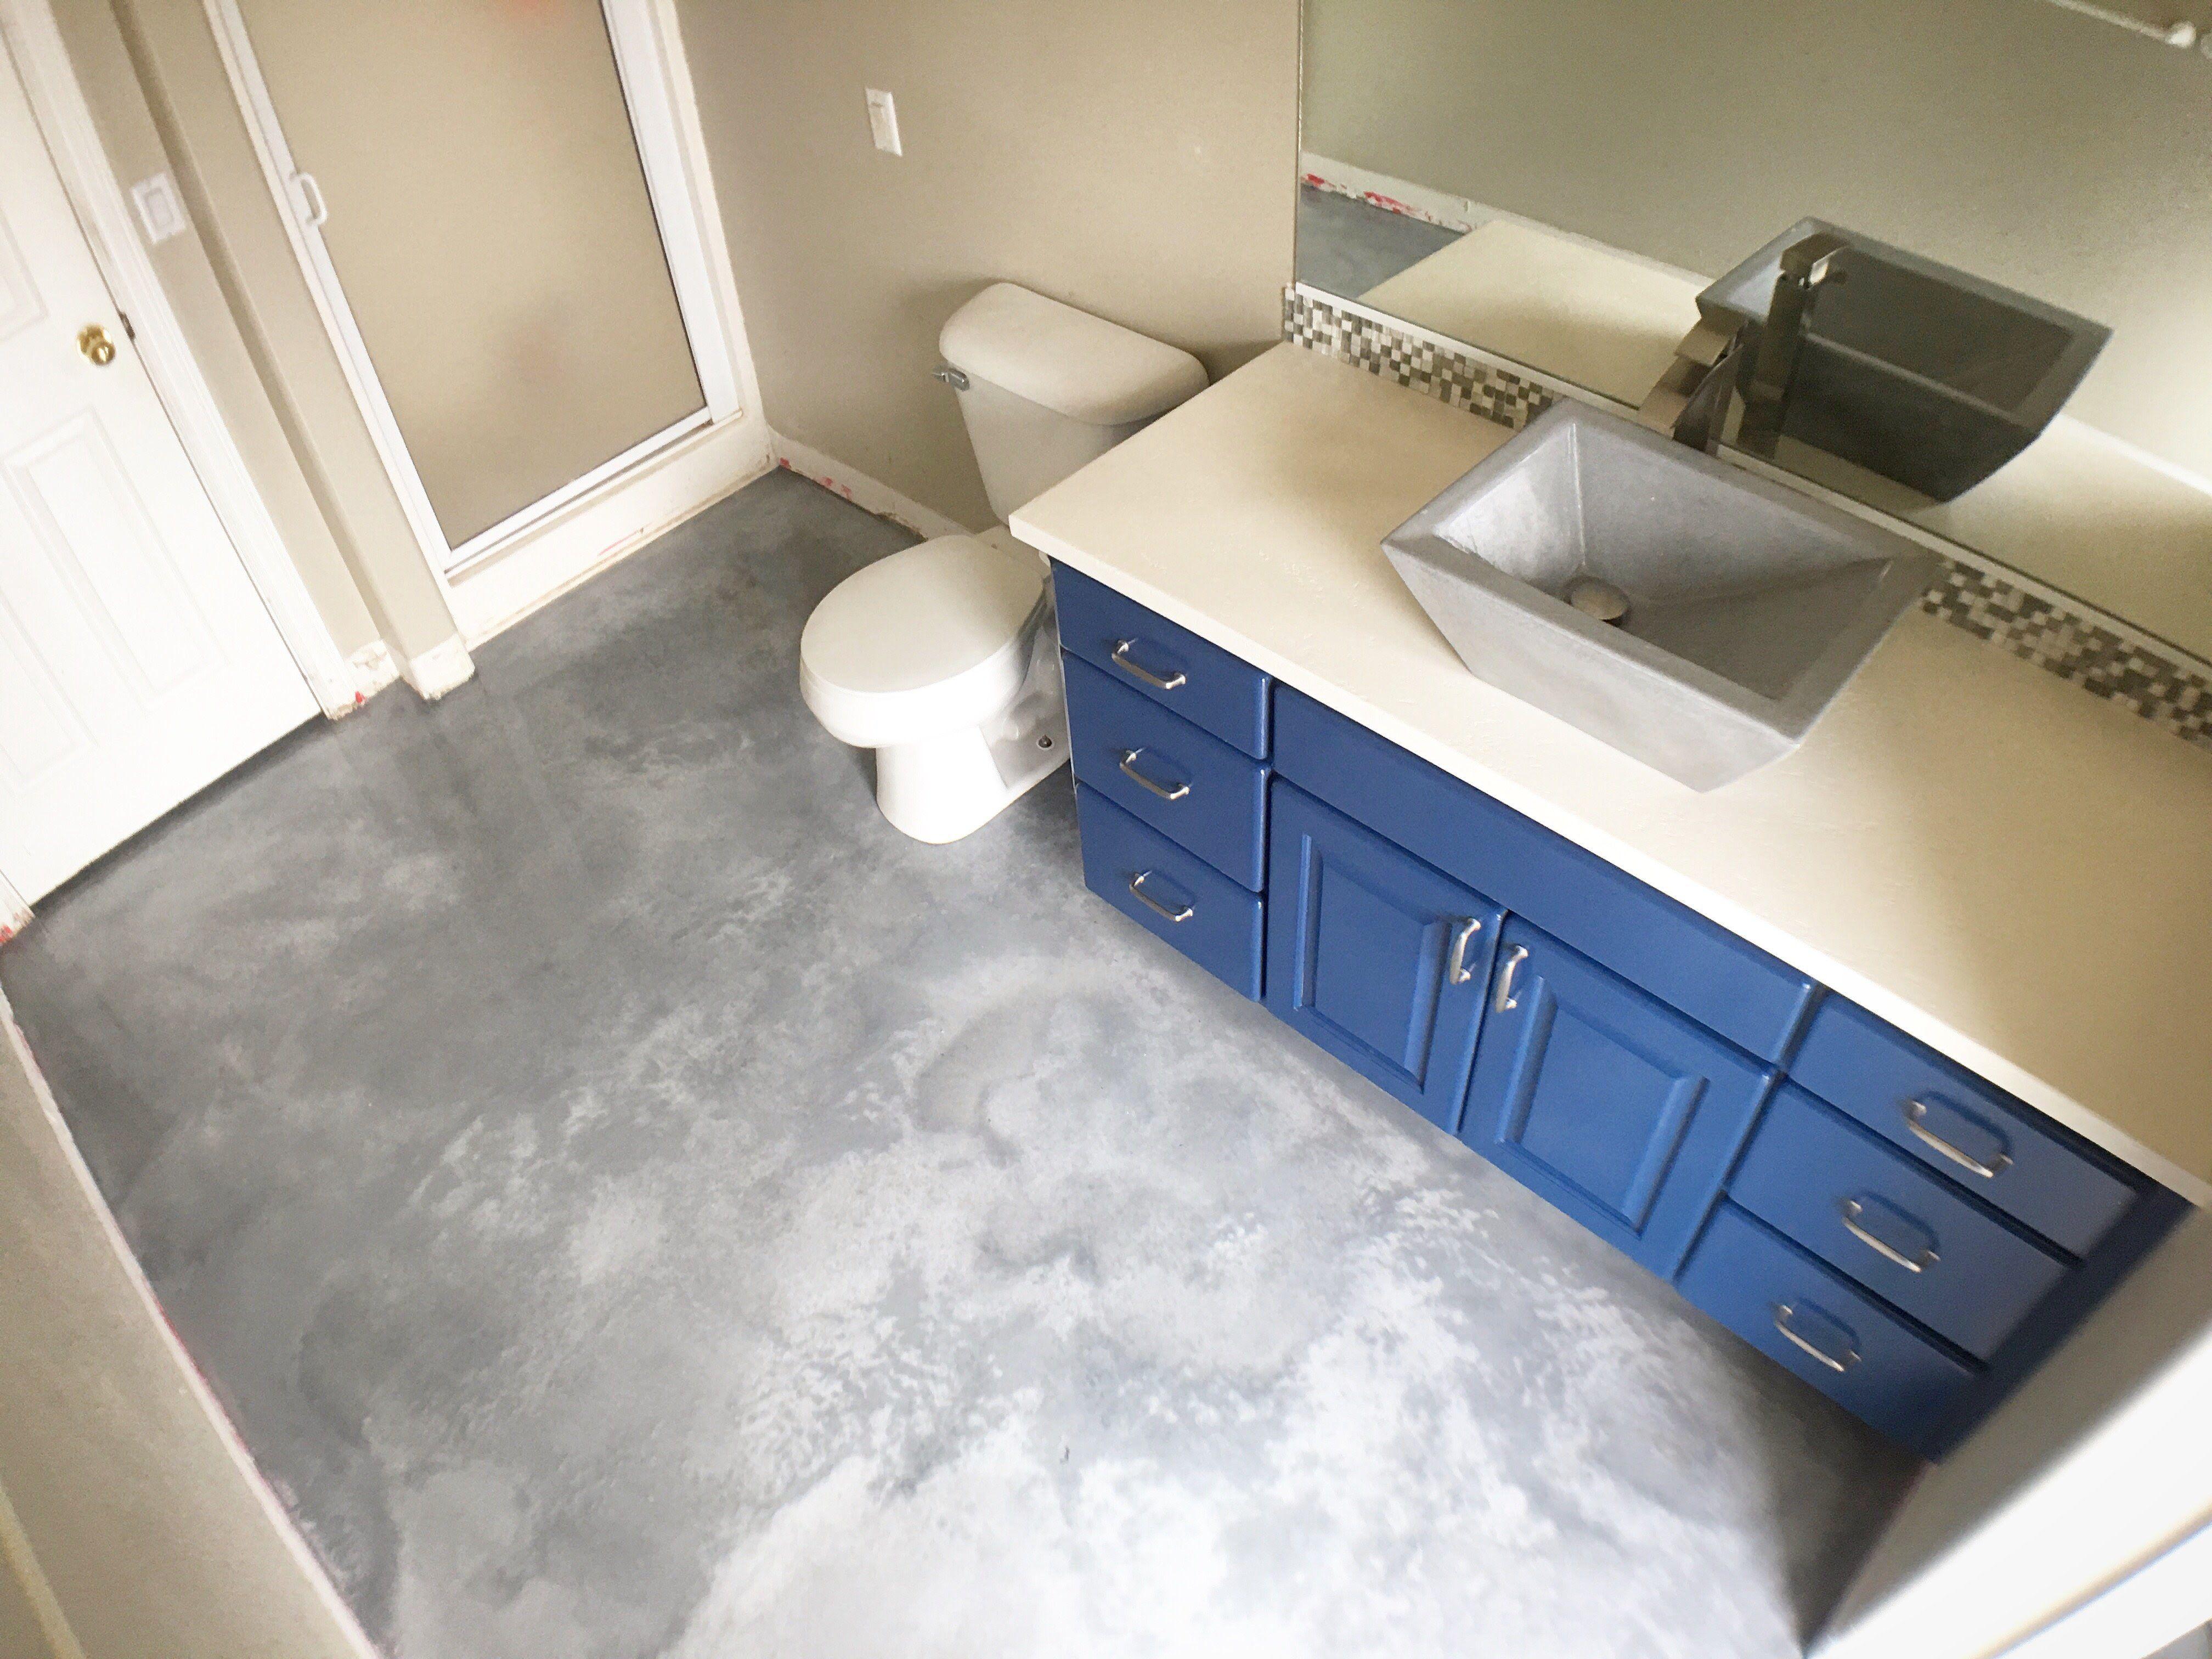 Bathroom Remodel Done By Elastocrete Training Group Bathrooms Remodel Bathroom Flooring Countertops